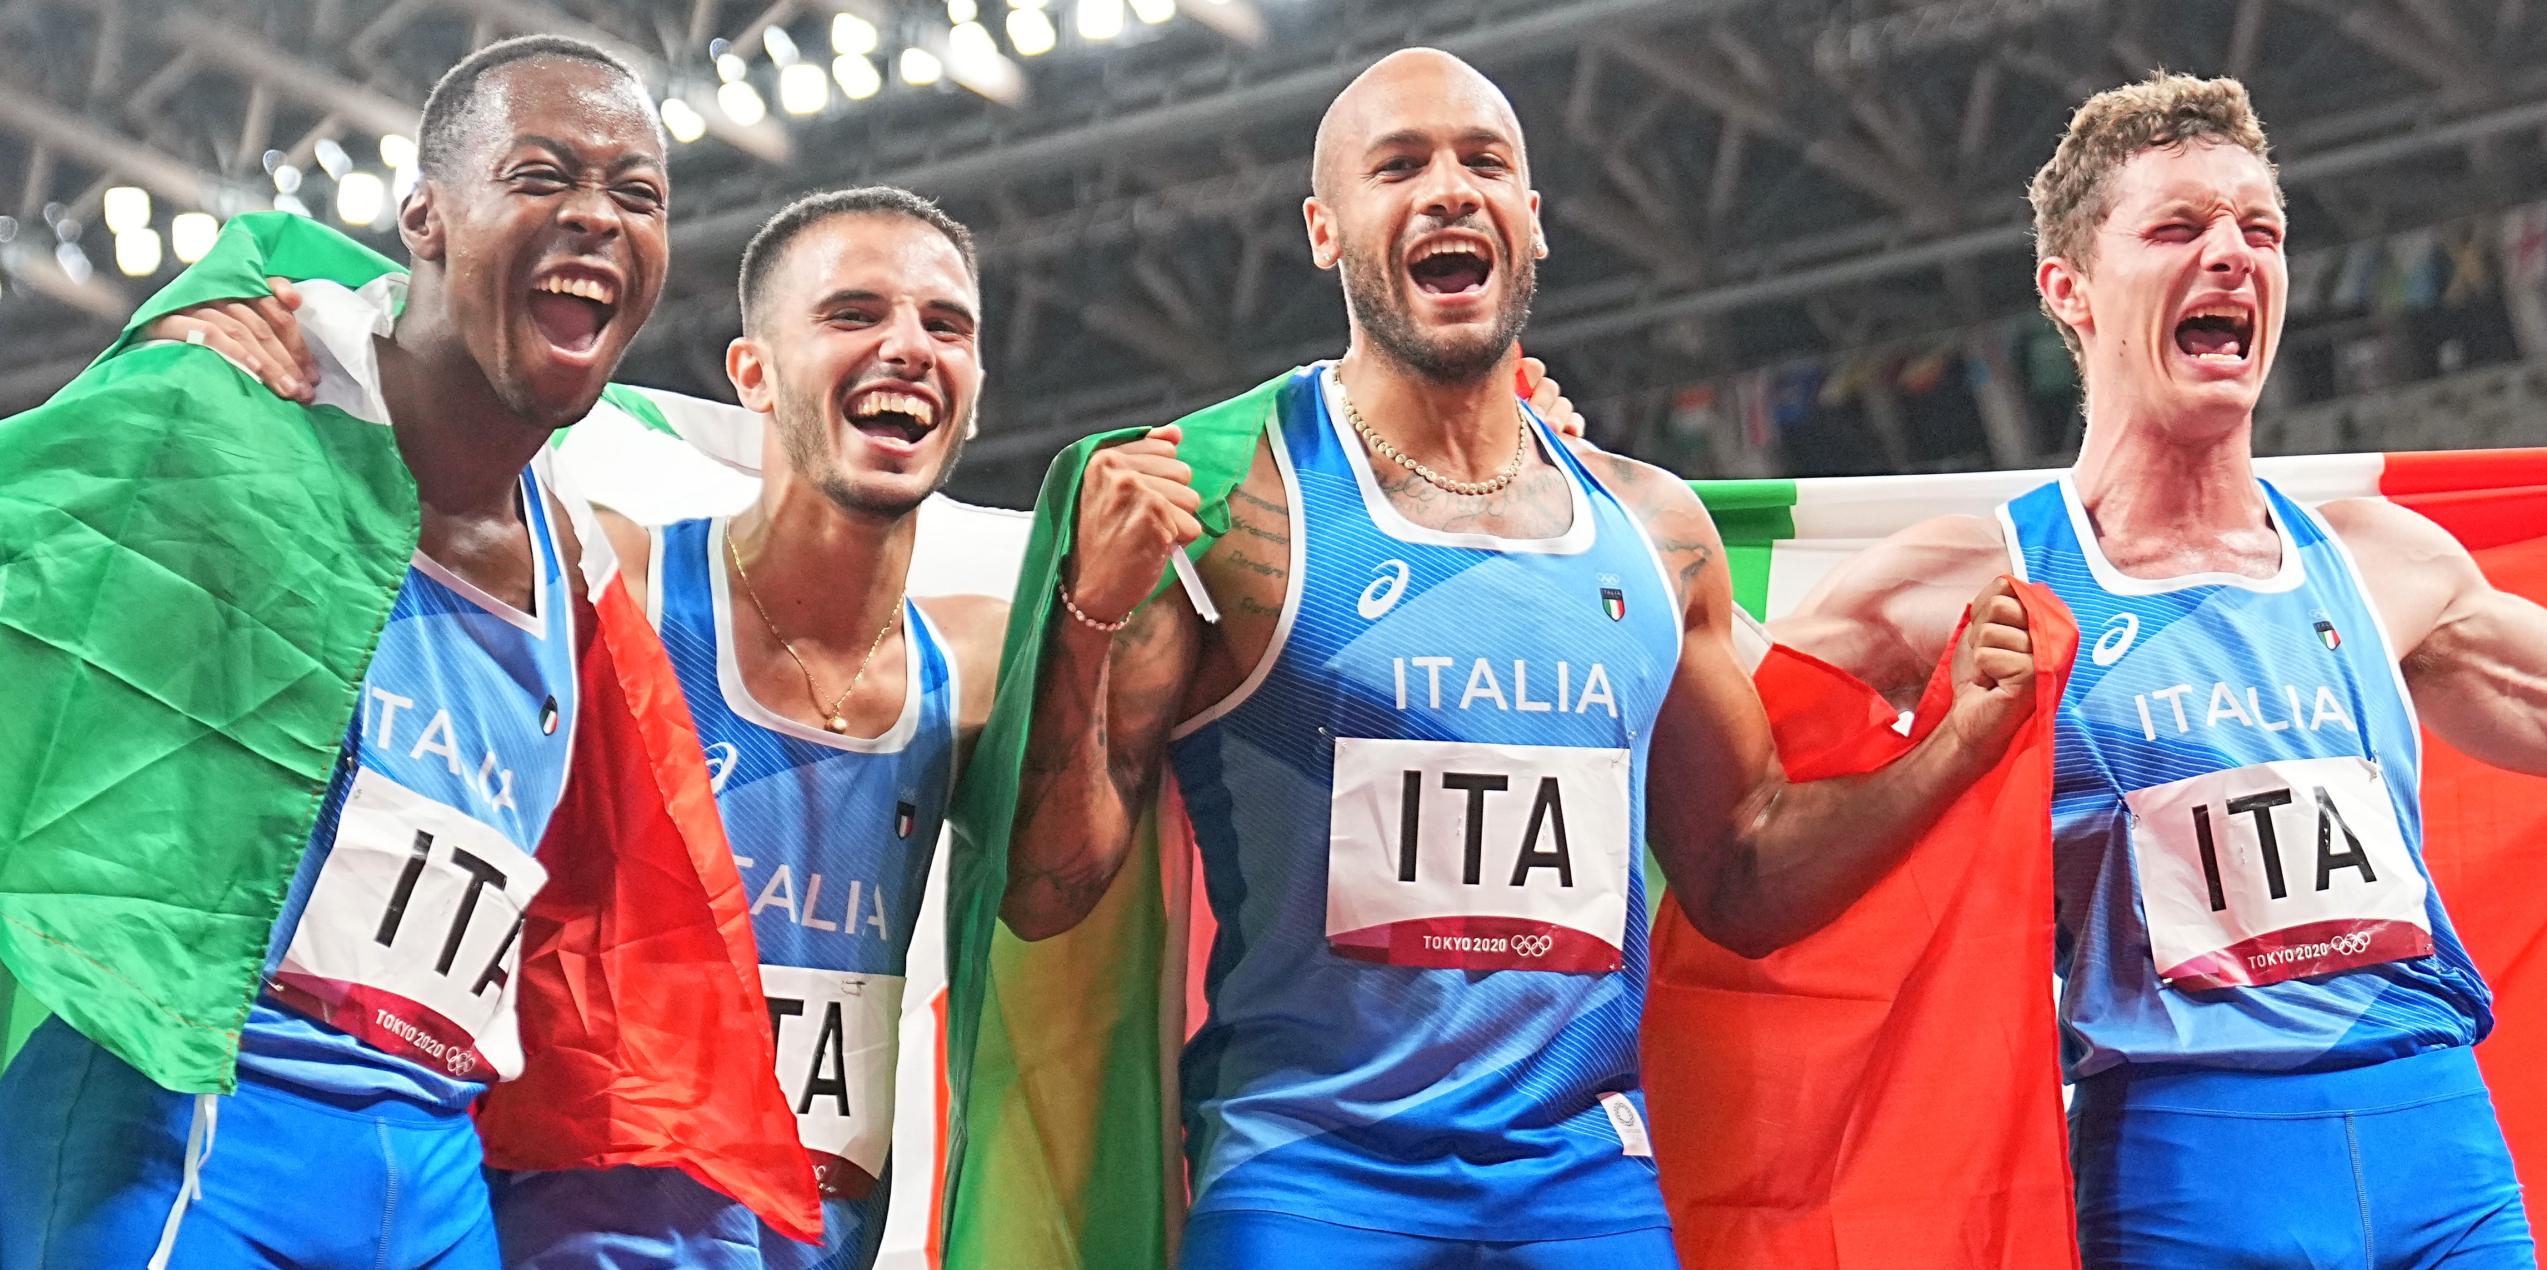 L'equip italià celebra la victòria al 4x100 | Europa Press